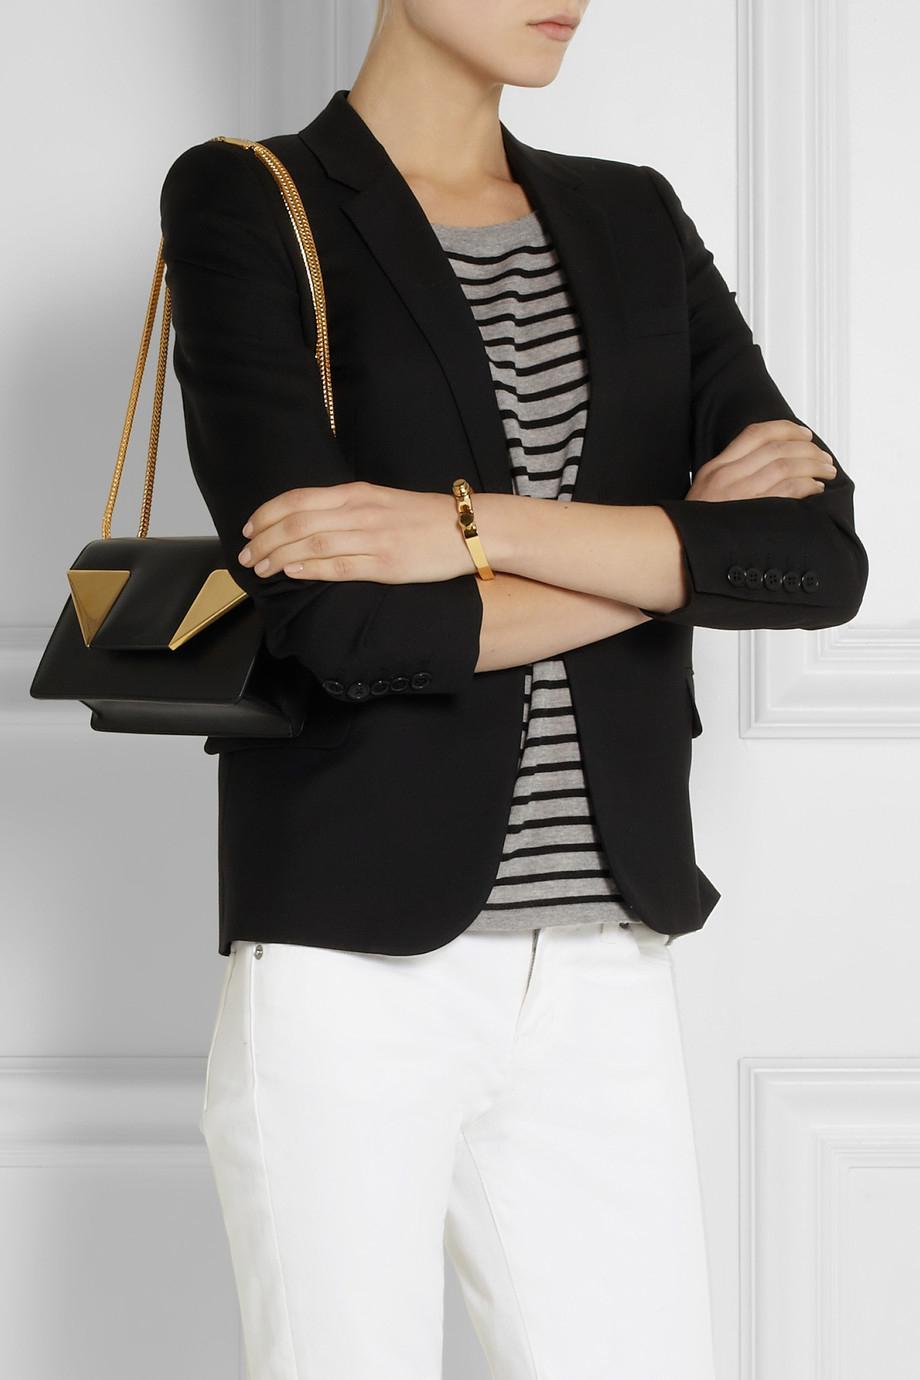 6453c4704e5 Lyst - Saint Laurent Betty Small Leather Shoulder Bag in Black